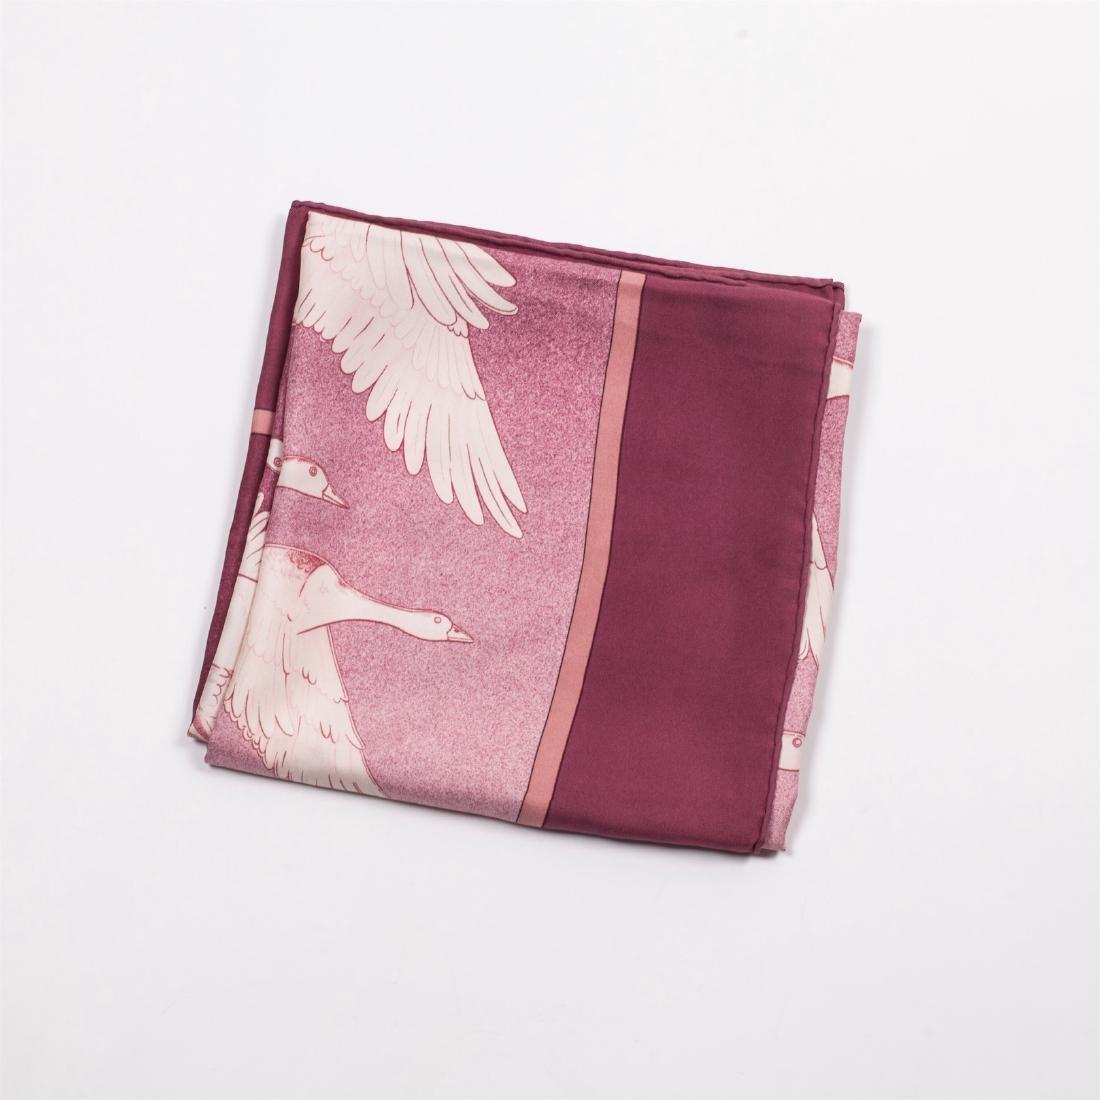 "Hermes ""Oiseaux migrateurs"" silk scarf.1977 - 2"